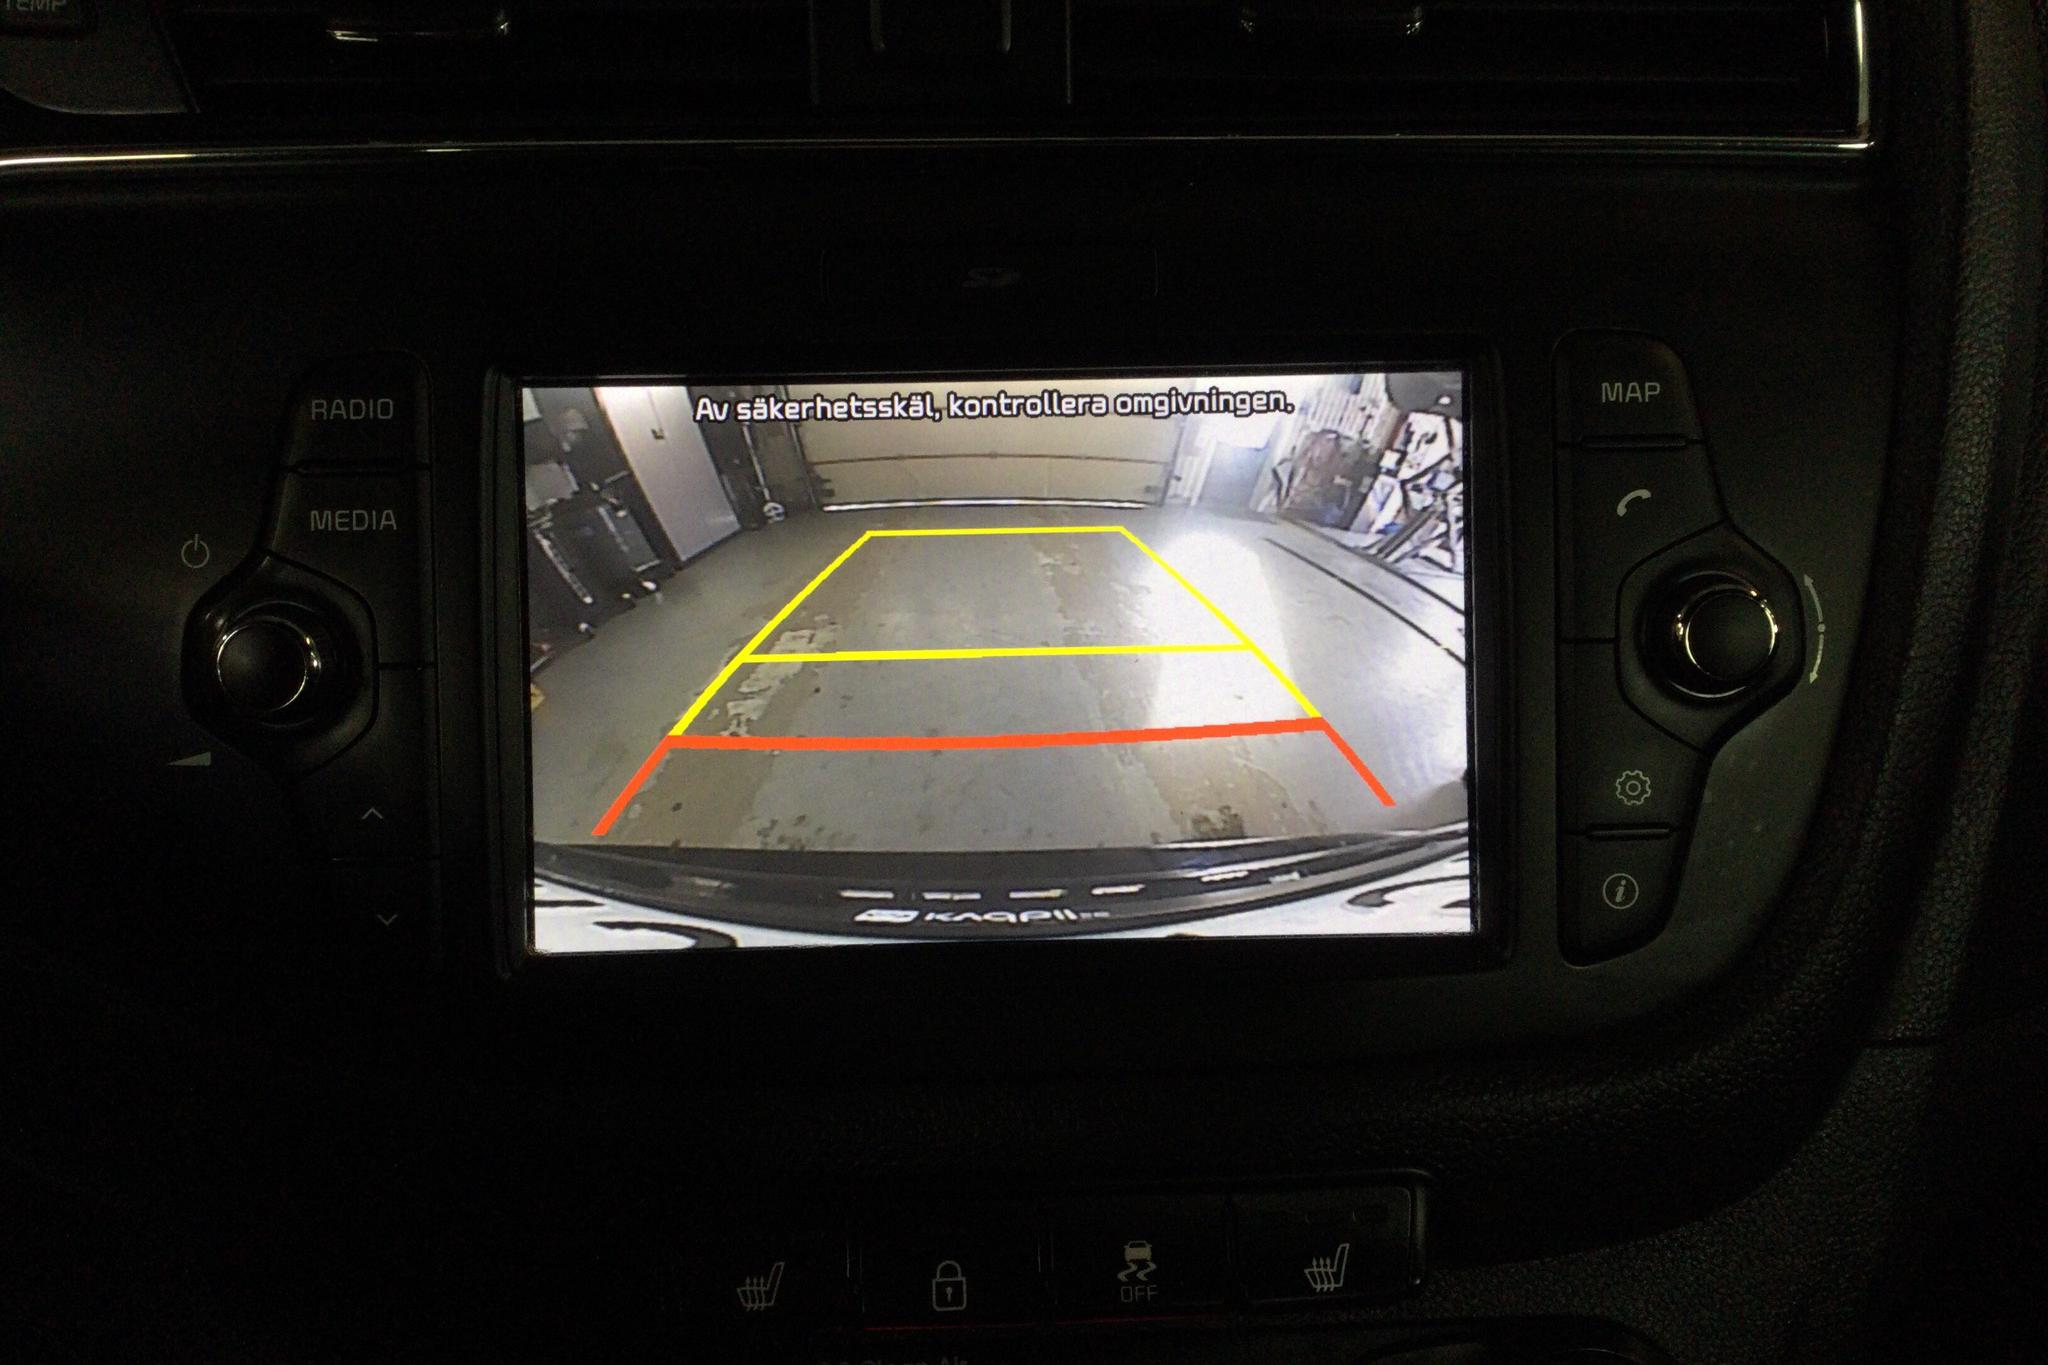 KIA Cee'd 1.6 CRDi SW (136hk) - 130 750 km - Automatic - black - 2017